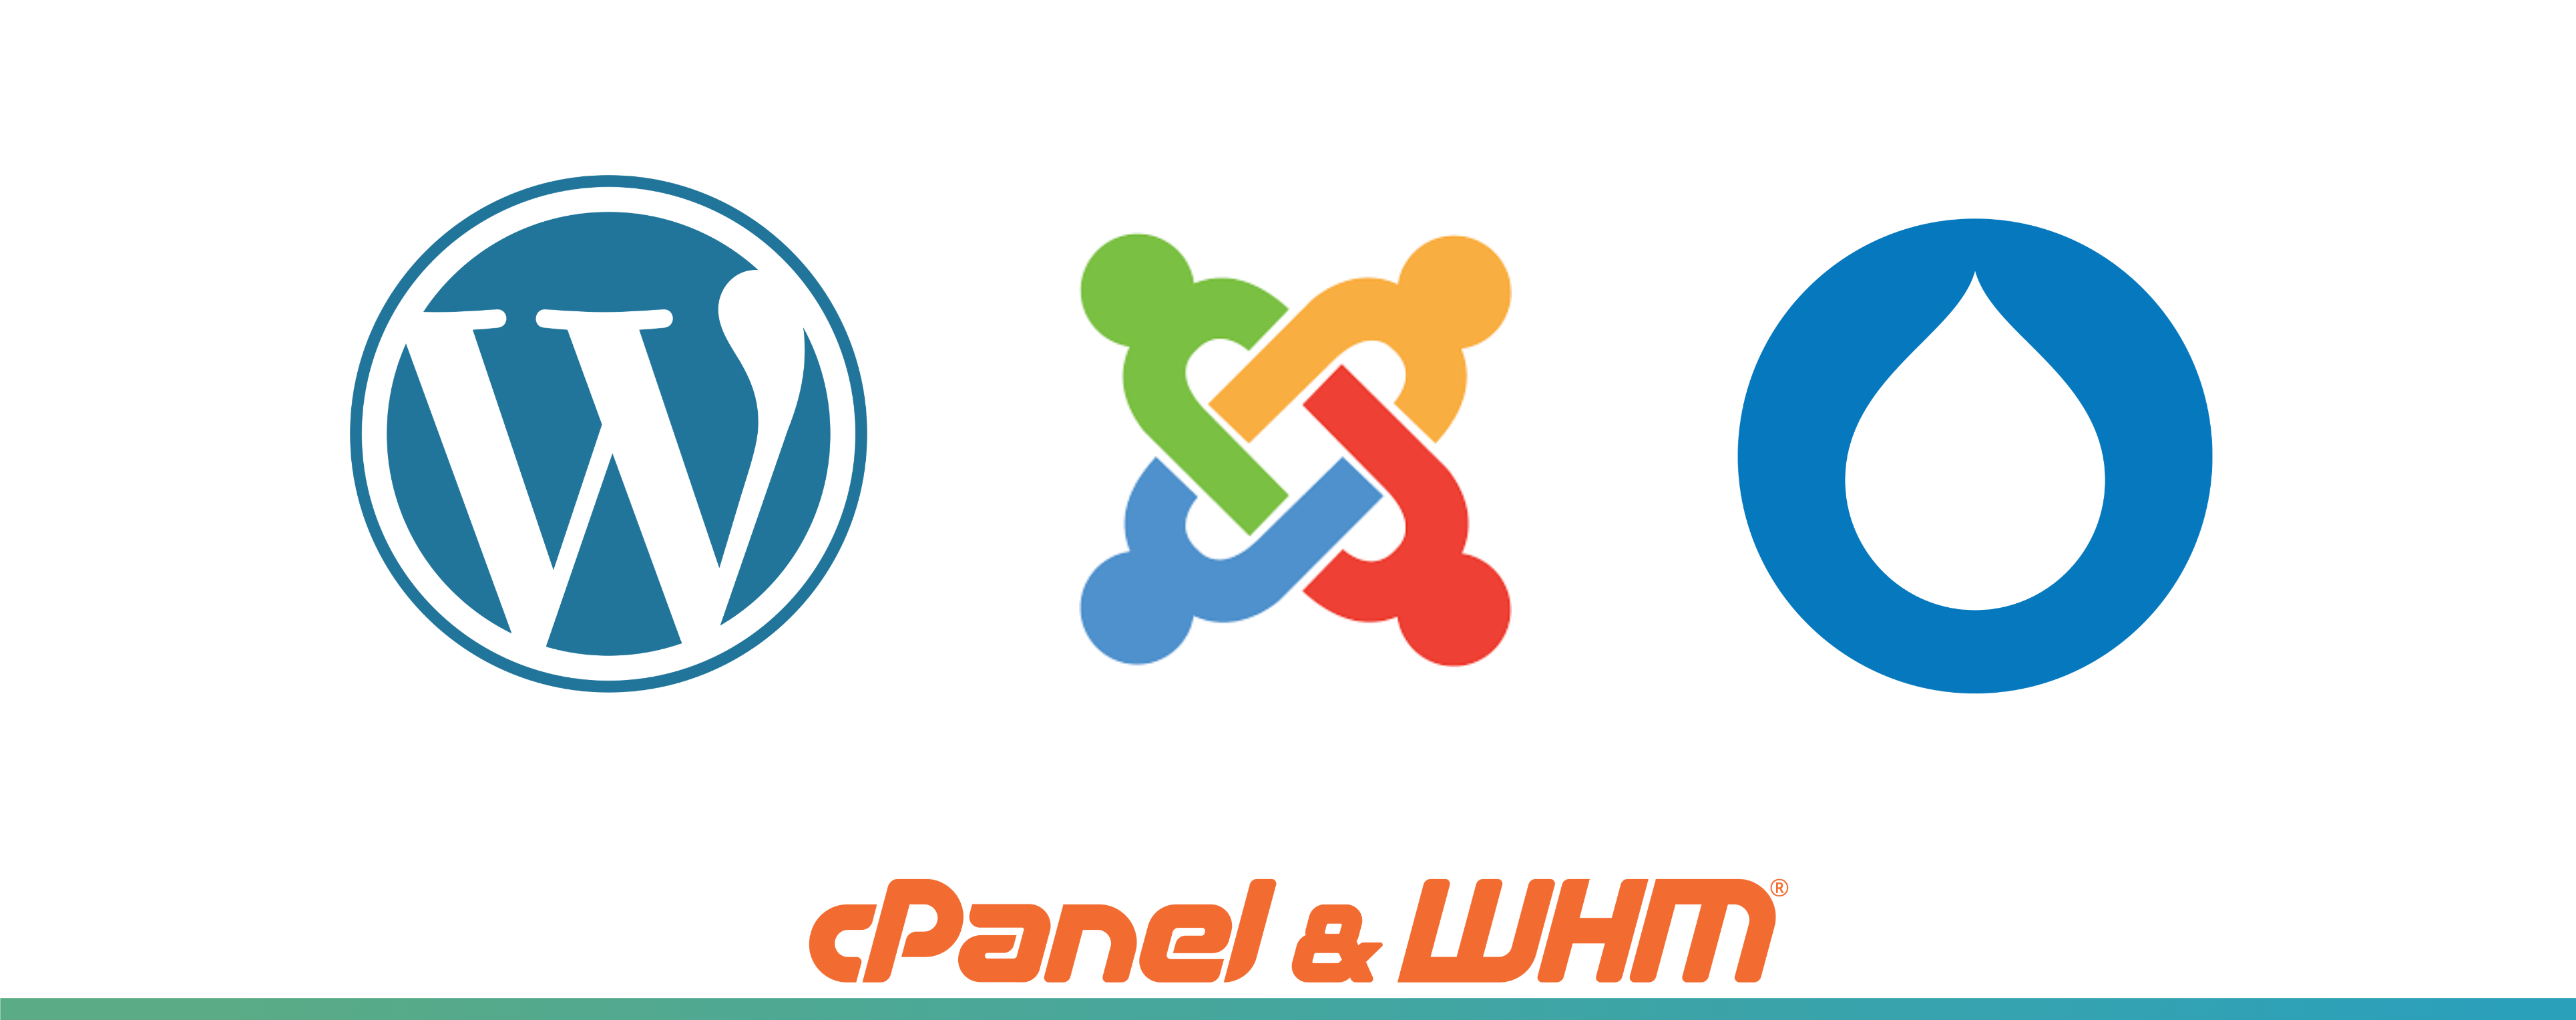 WordPress/Joomla!/Drupal- A Security Comparison | cPanel Blog